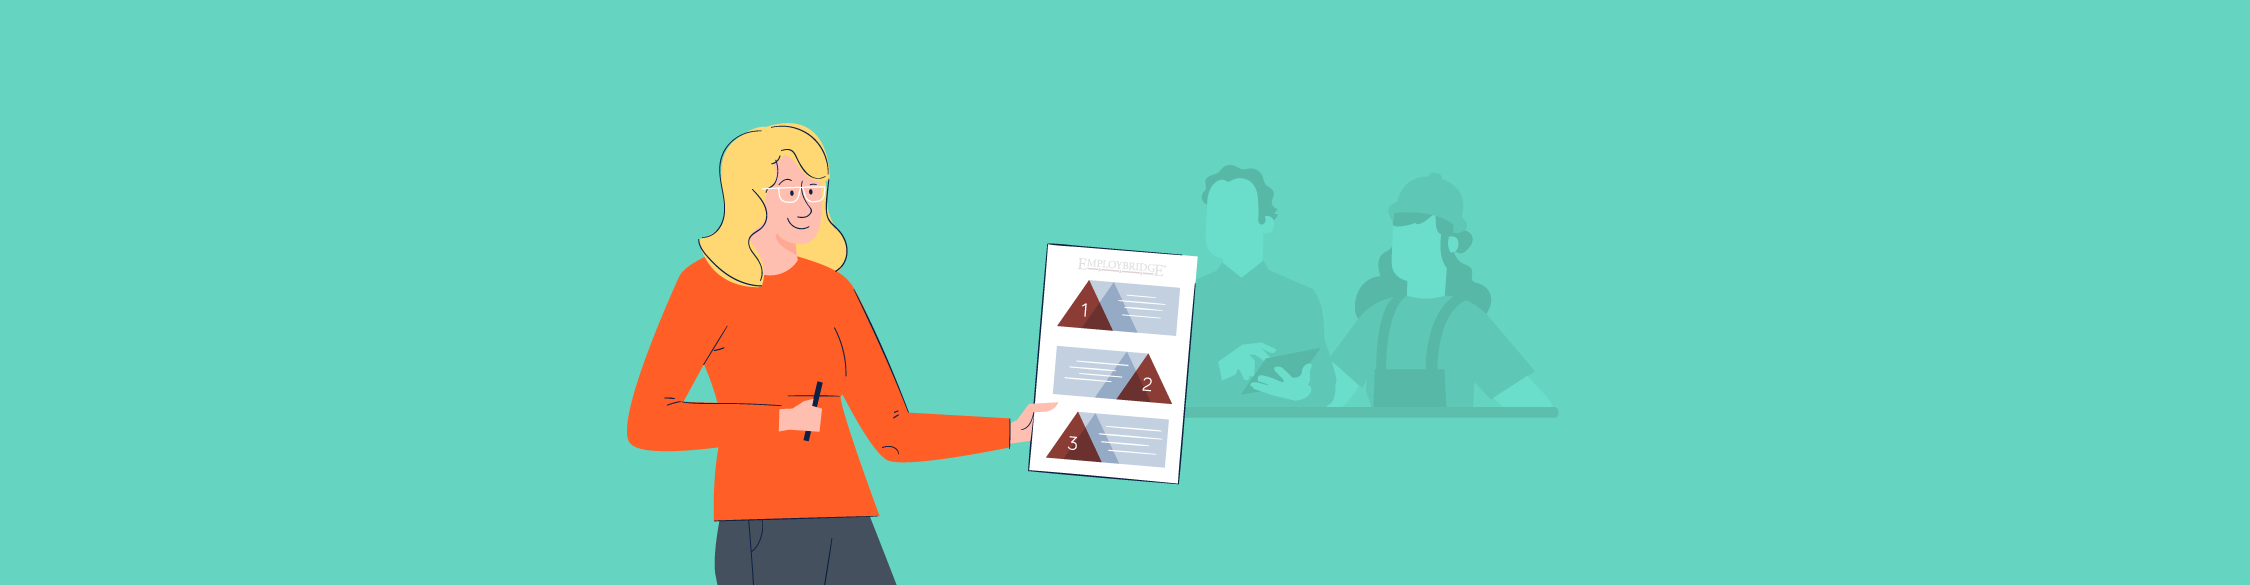 How EmployBridge is Using Visme to Streamline Content Creation Cross-Departmentally